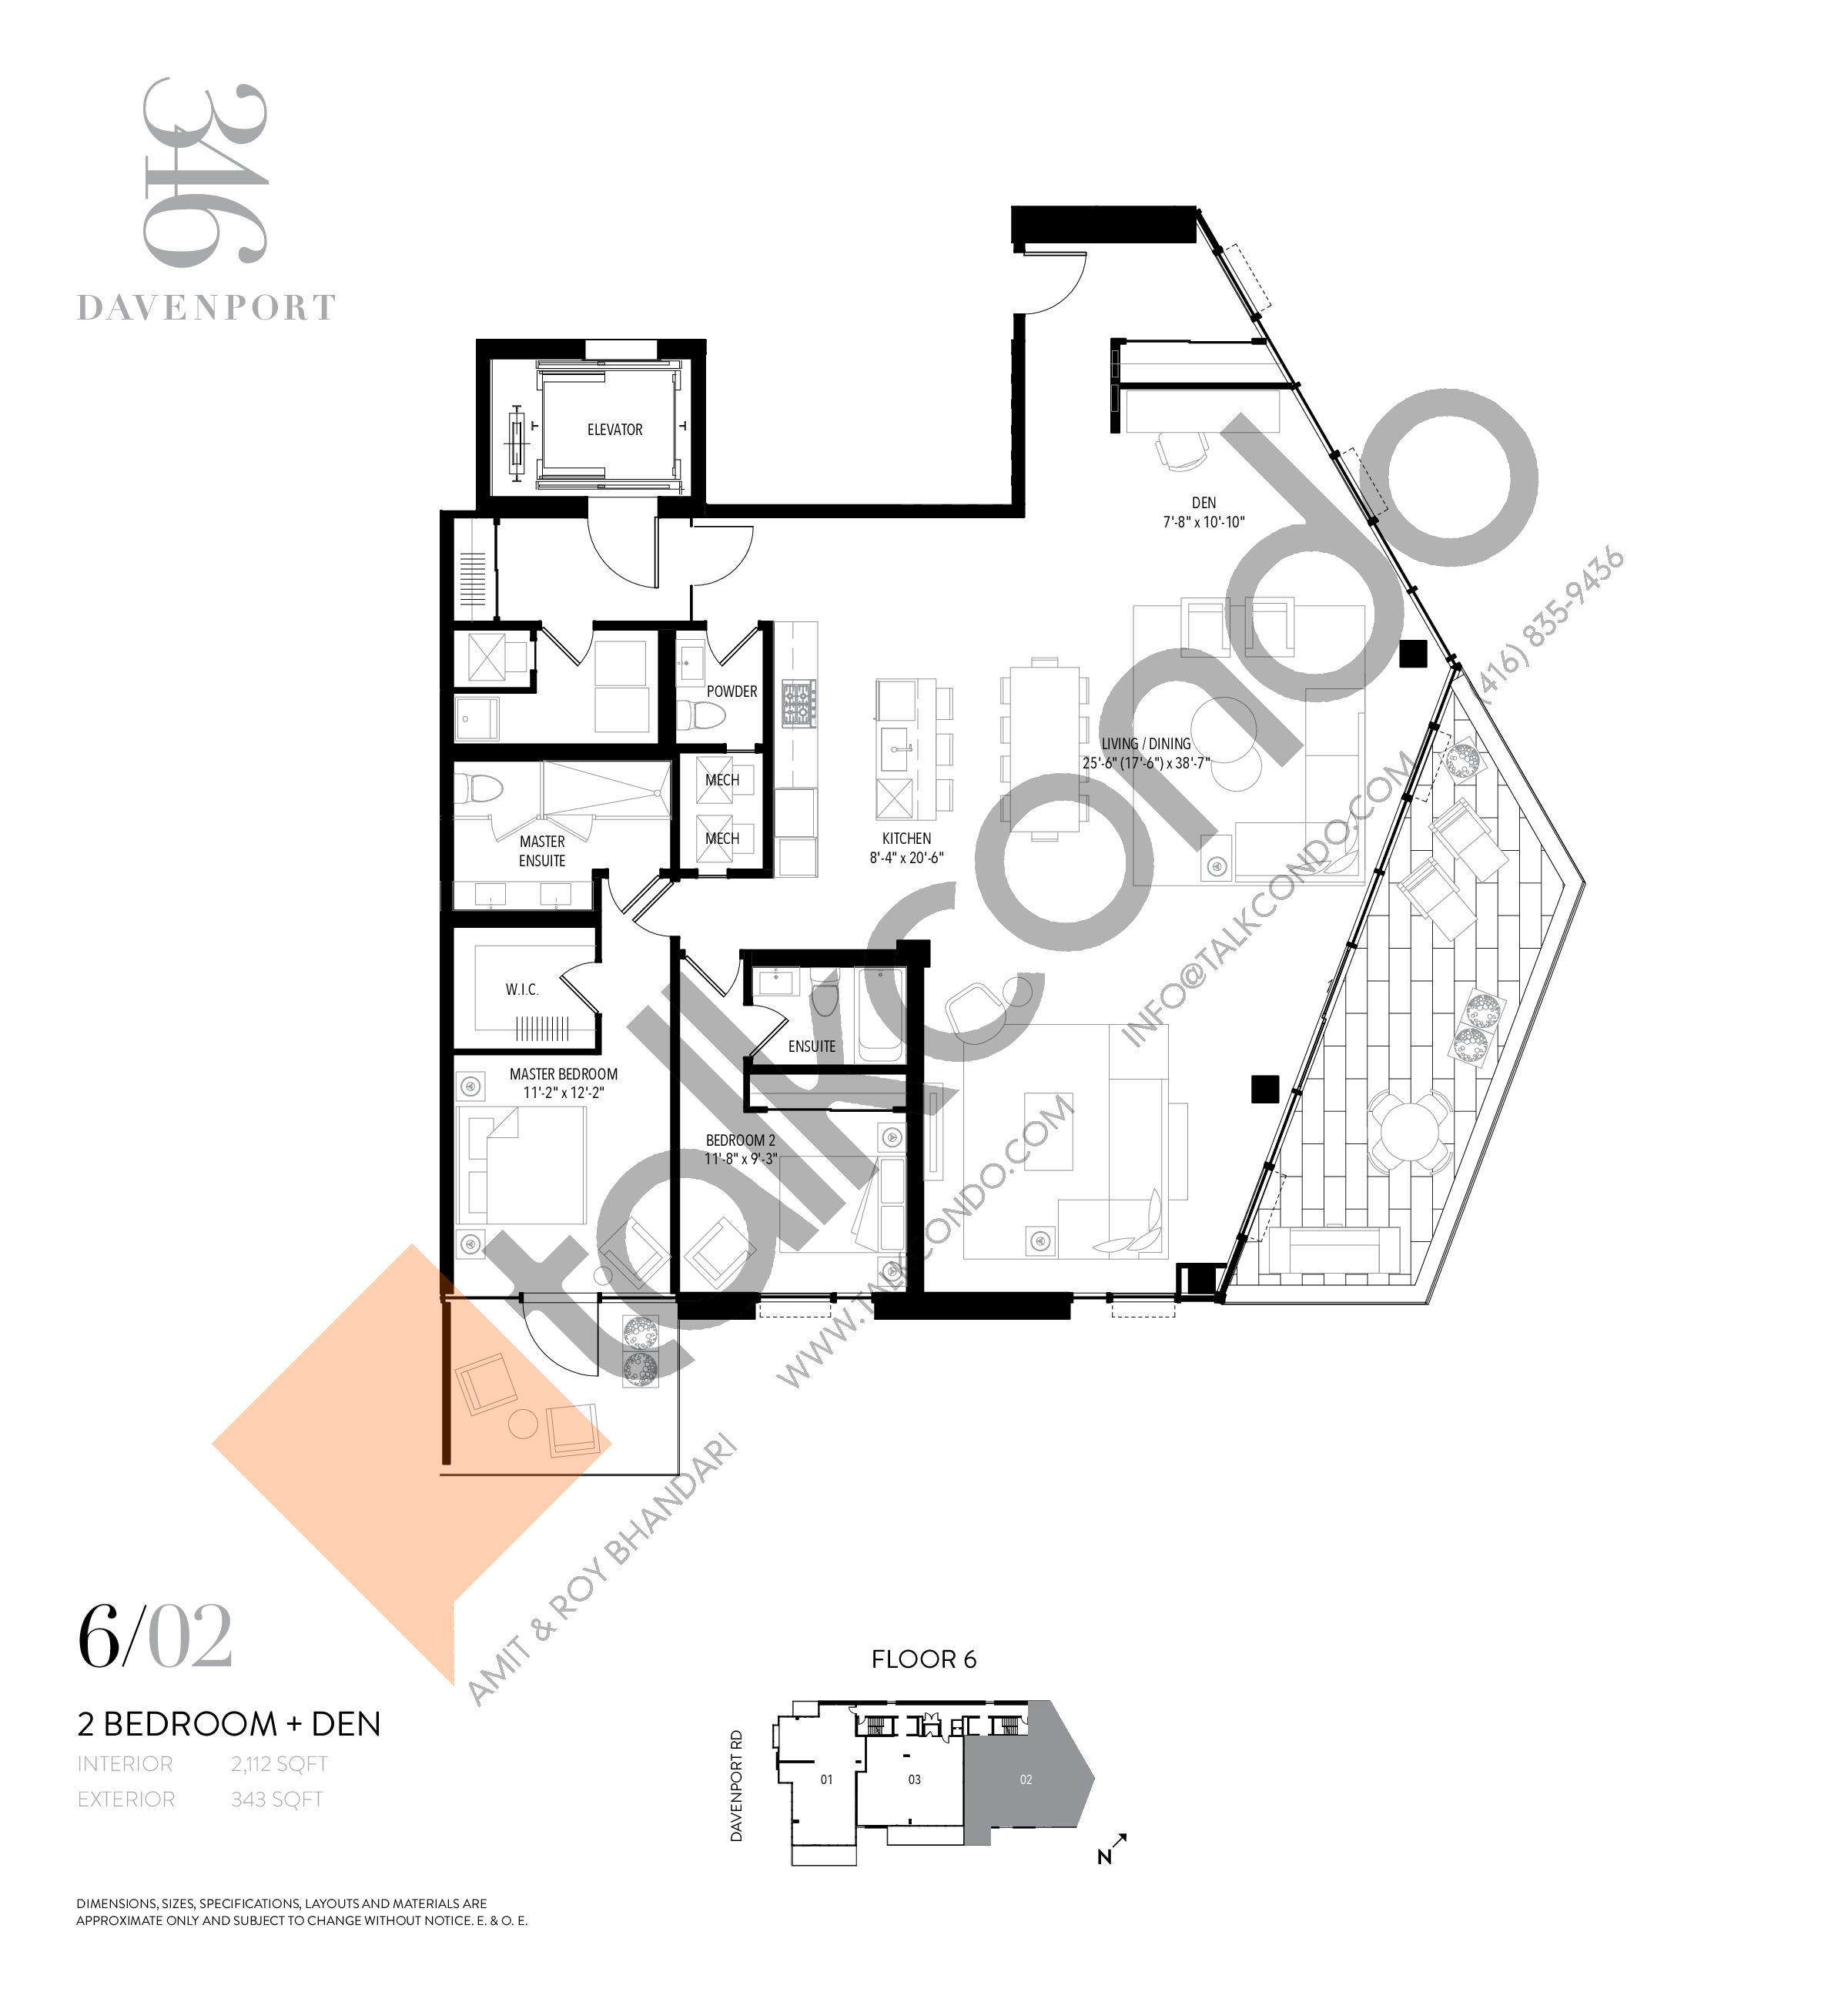 Unit 602 Floor Plan at 346 Davenport Condos - 2112 sq.ft